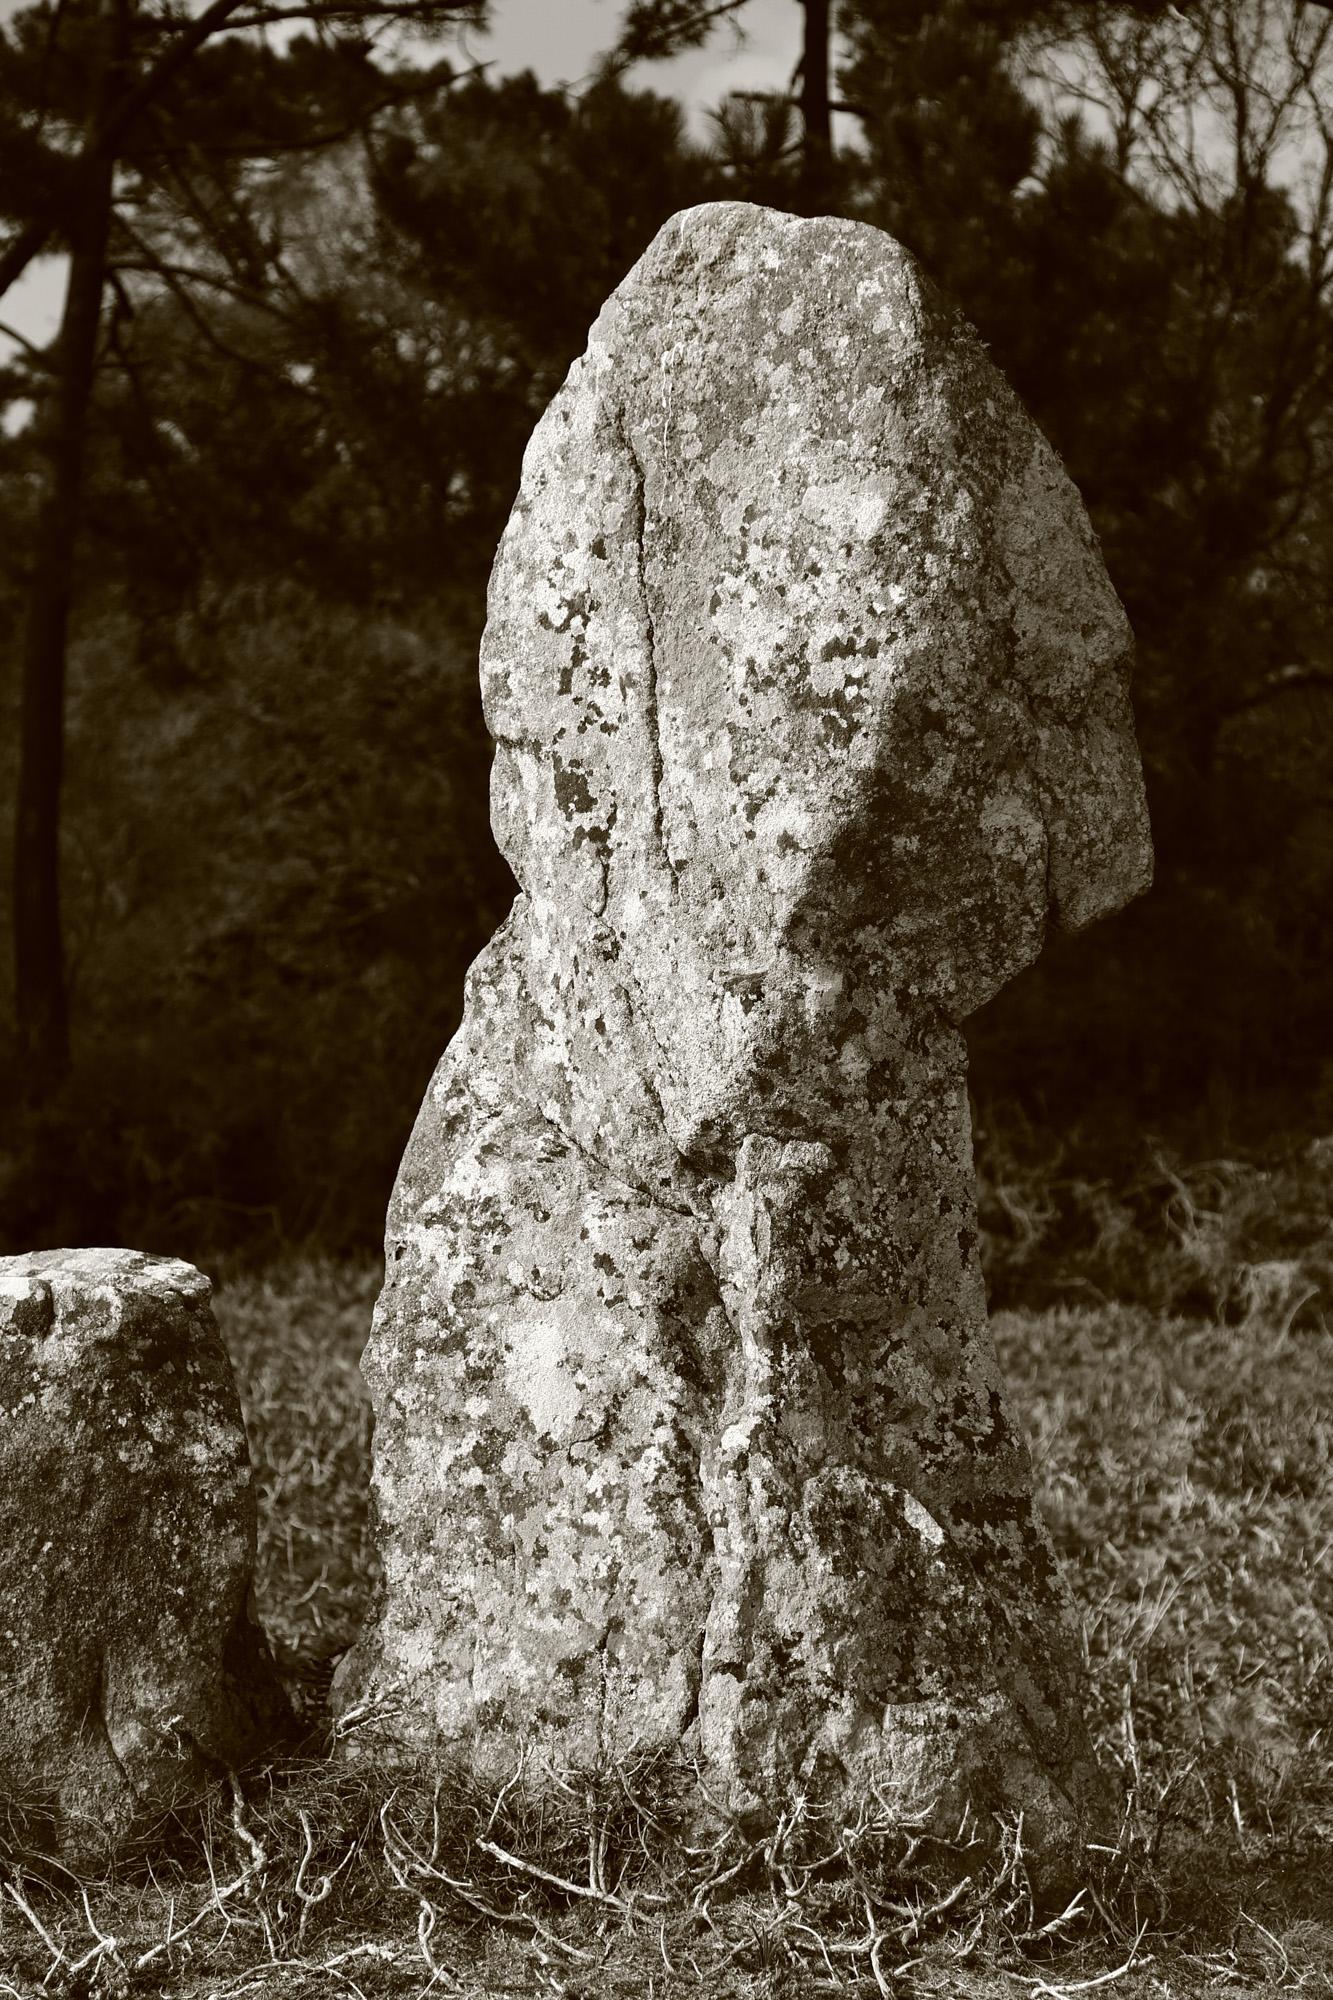 20160323_france_bretagne_carnac_stones-54.jpg